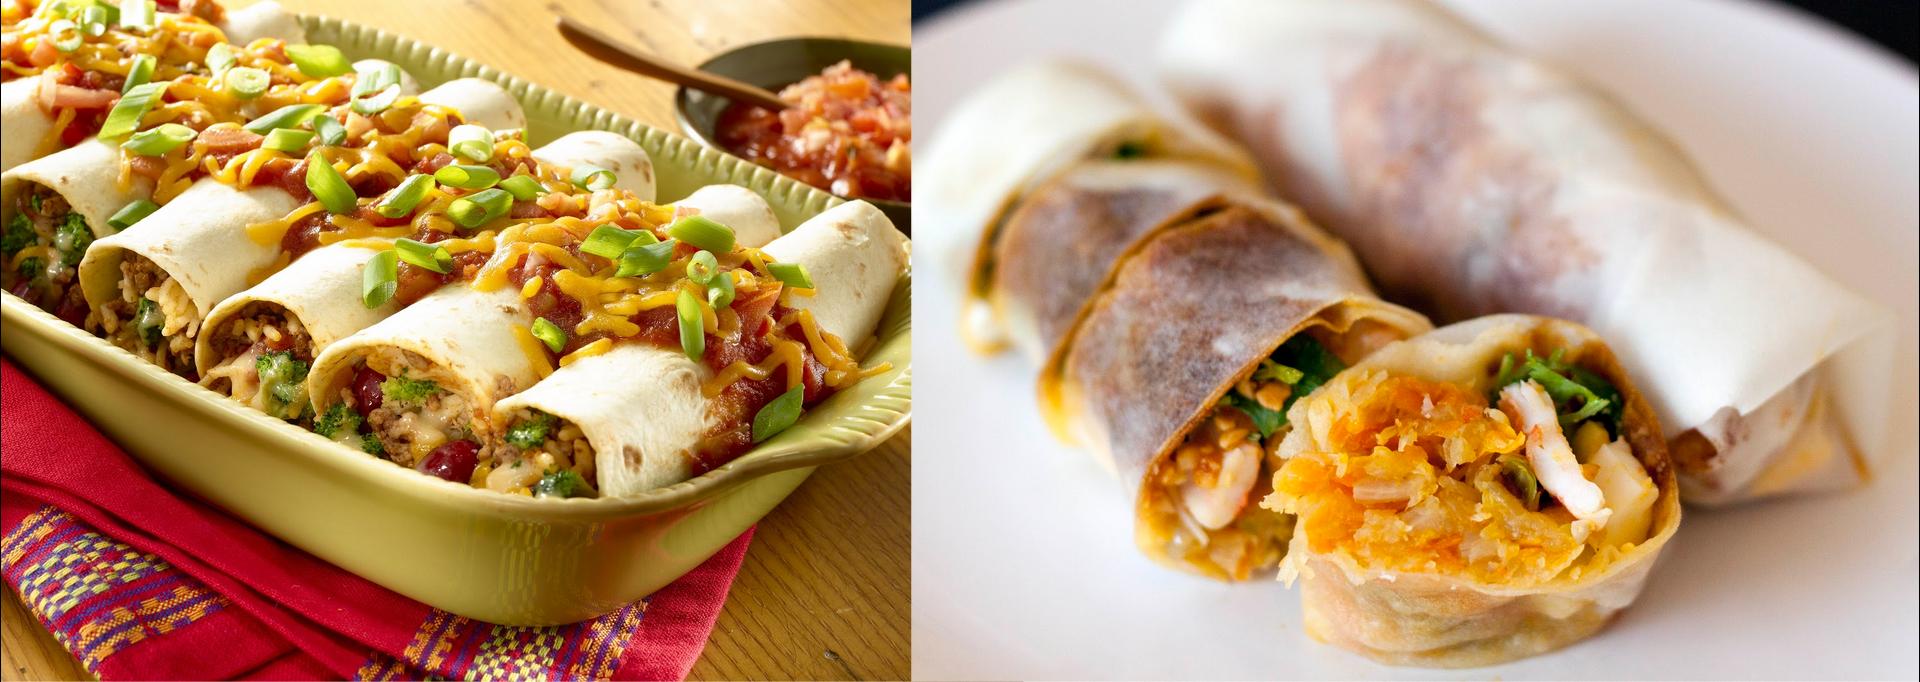 popiah vs burrito